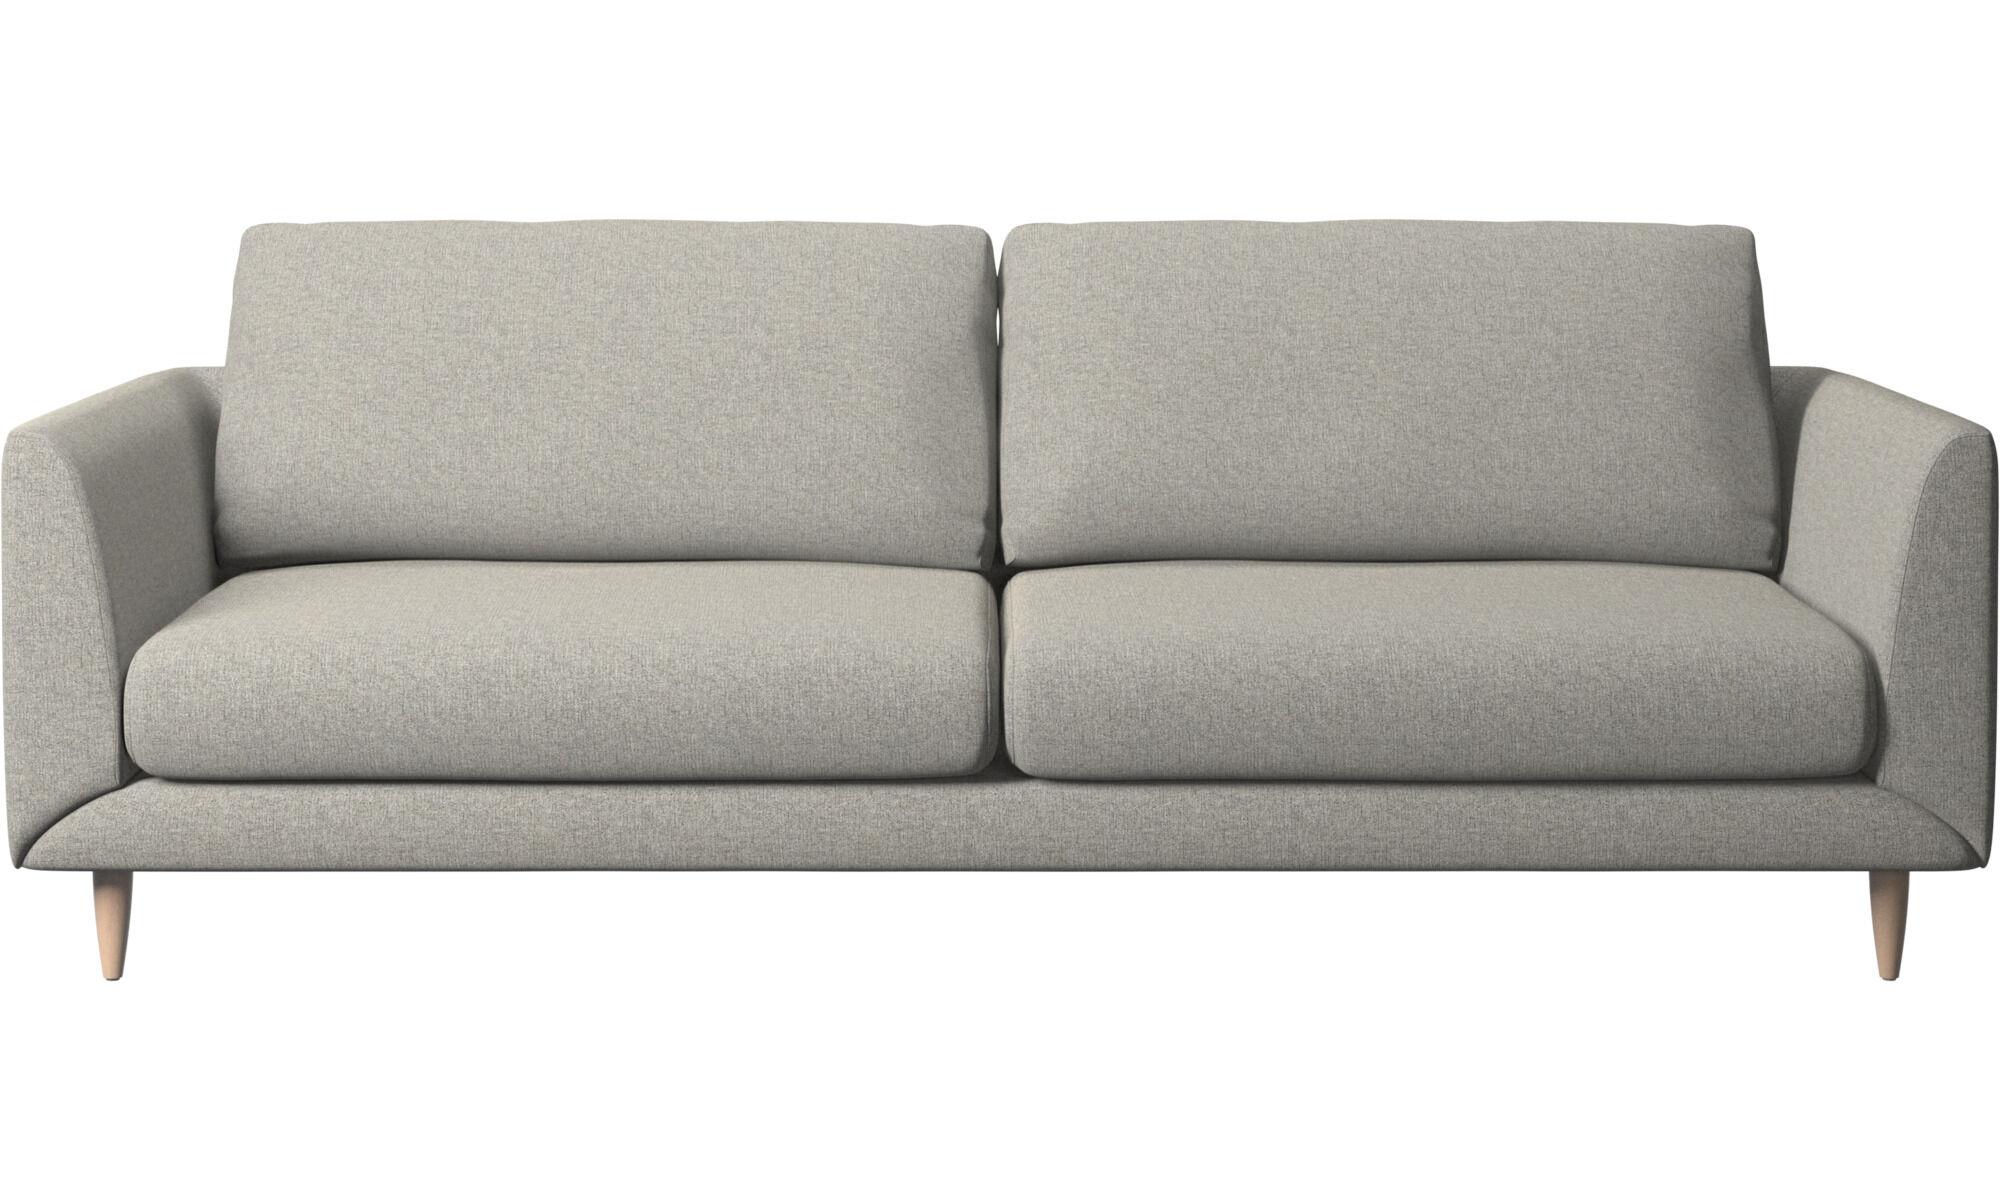 Beautiful 3 Seater Sofas   Fargo Sofa   Gray   Fabric